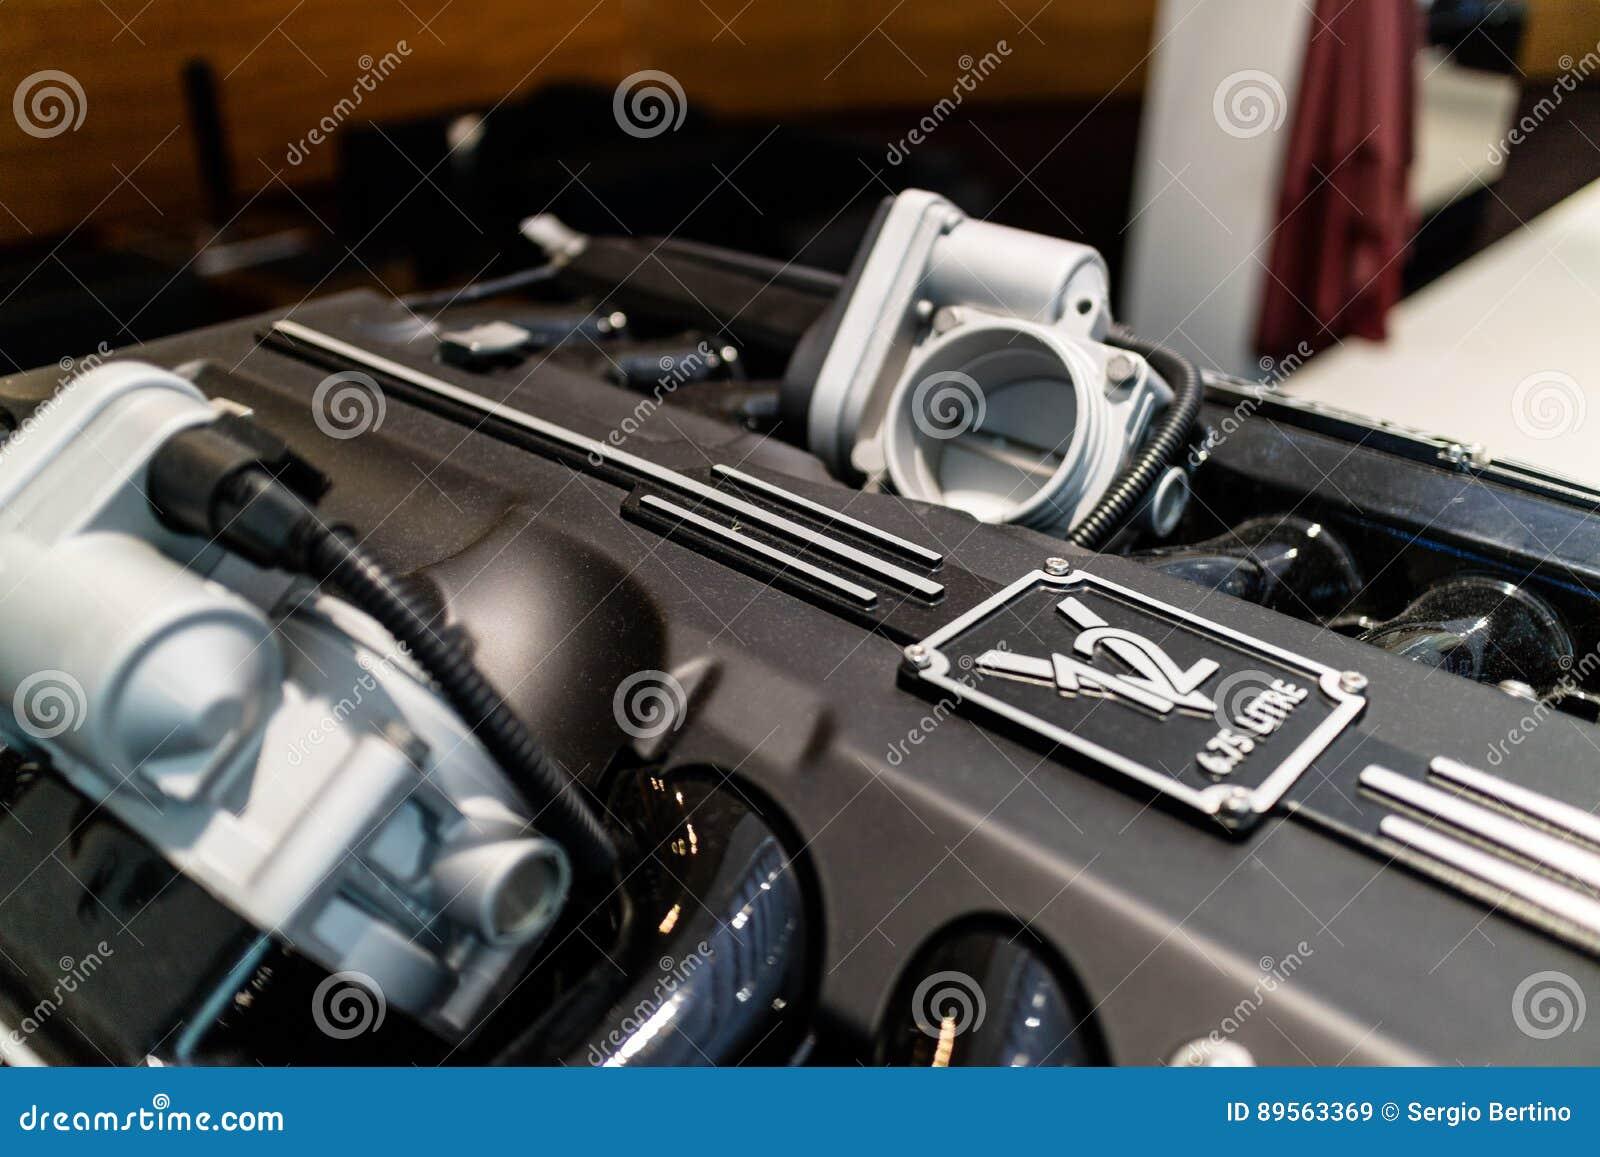 engine close up stock photography 7992314. Black Bedroom Furniture Sets. Home Design Ideas